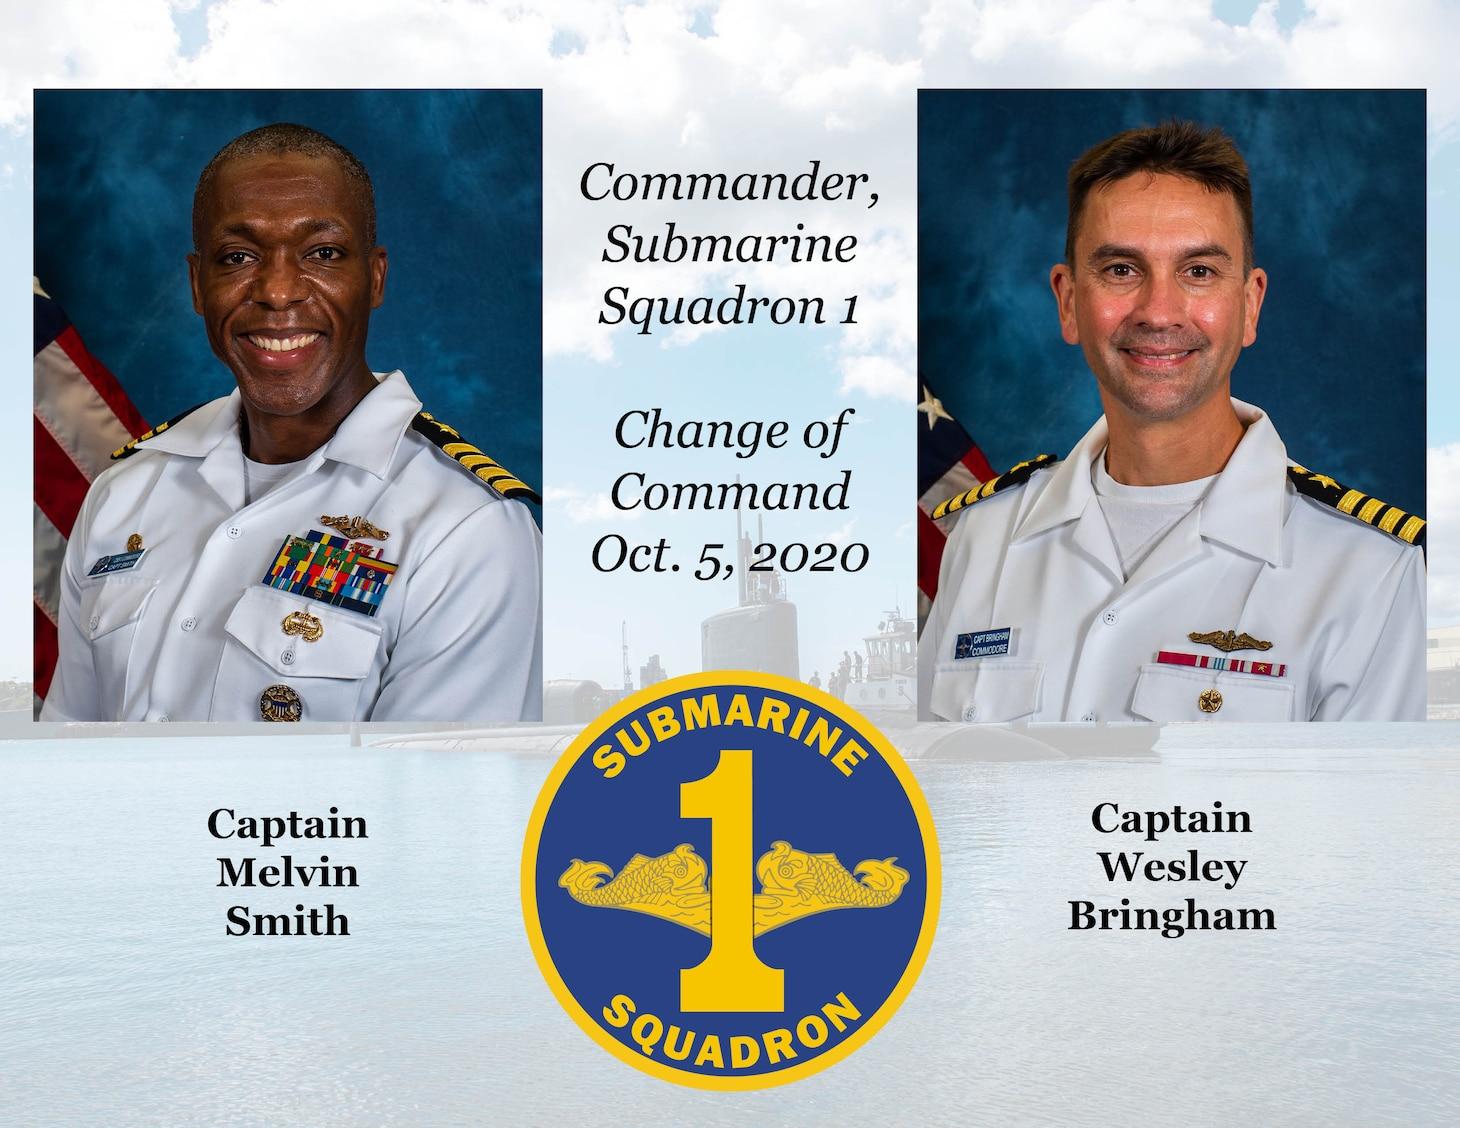 Change of Command Graphic for Commander, Submarine Squadron 1. (U.S. Navy/MC1 Michael Zingaro)